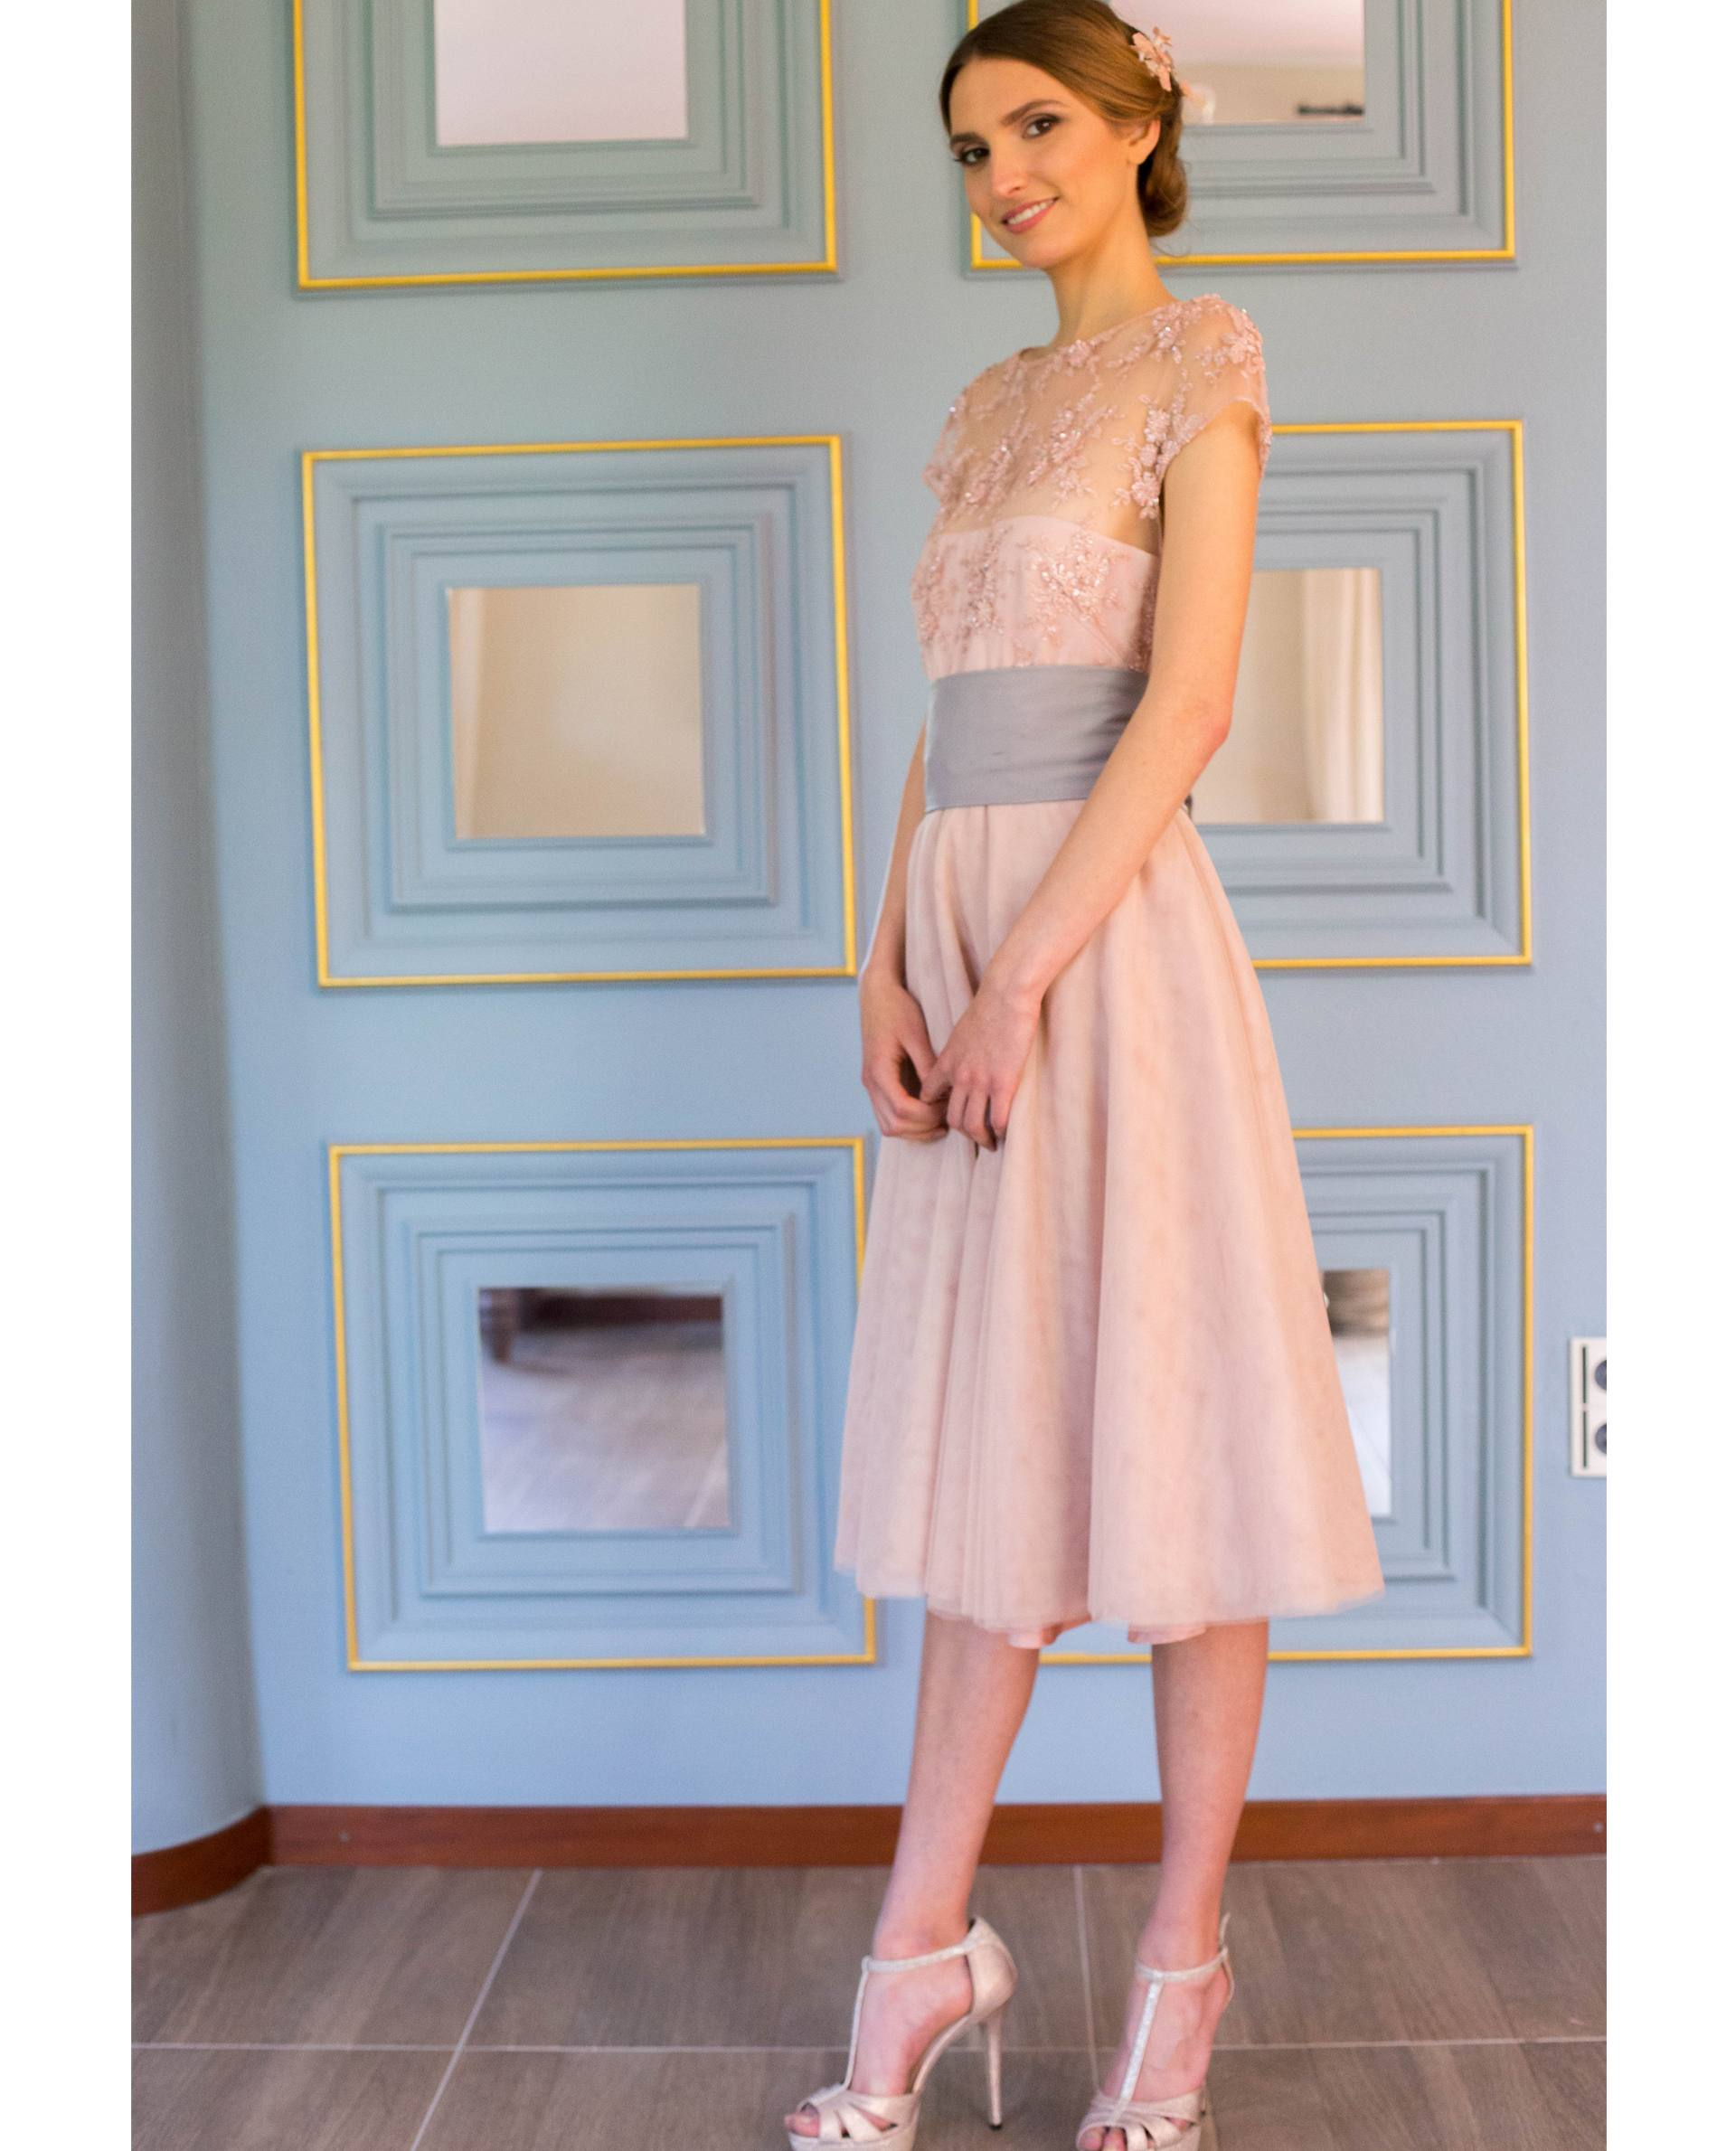 ATELIER-NATURE 2019 - VESTIDOS - vestido fiesta CAROLA rosa palo